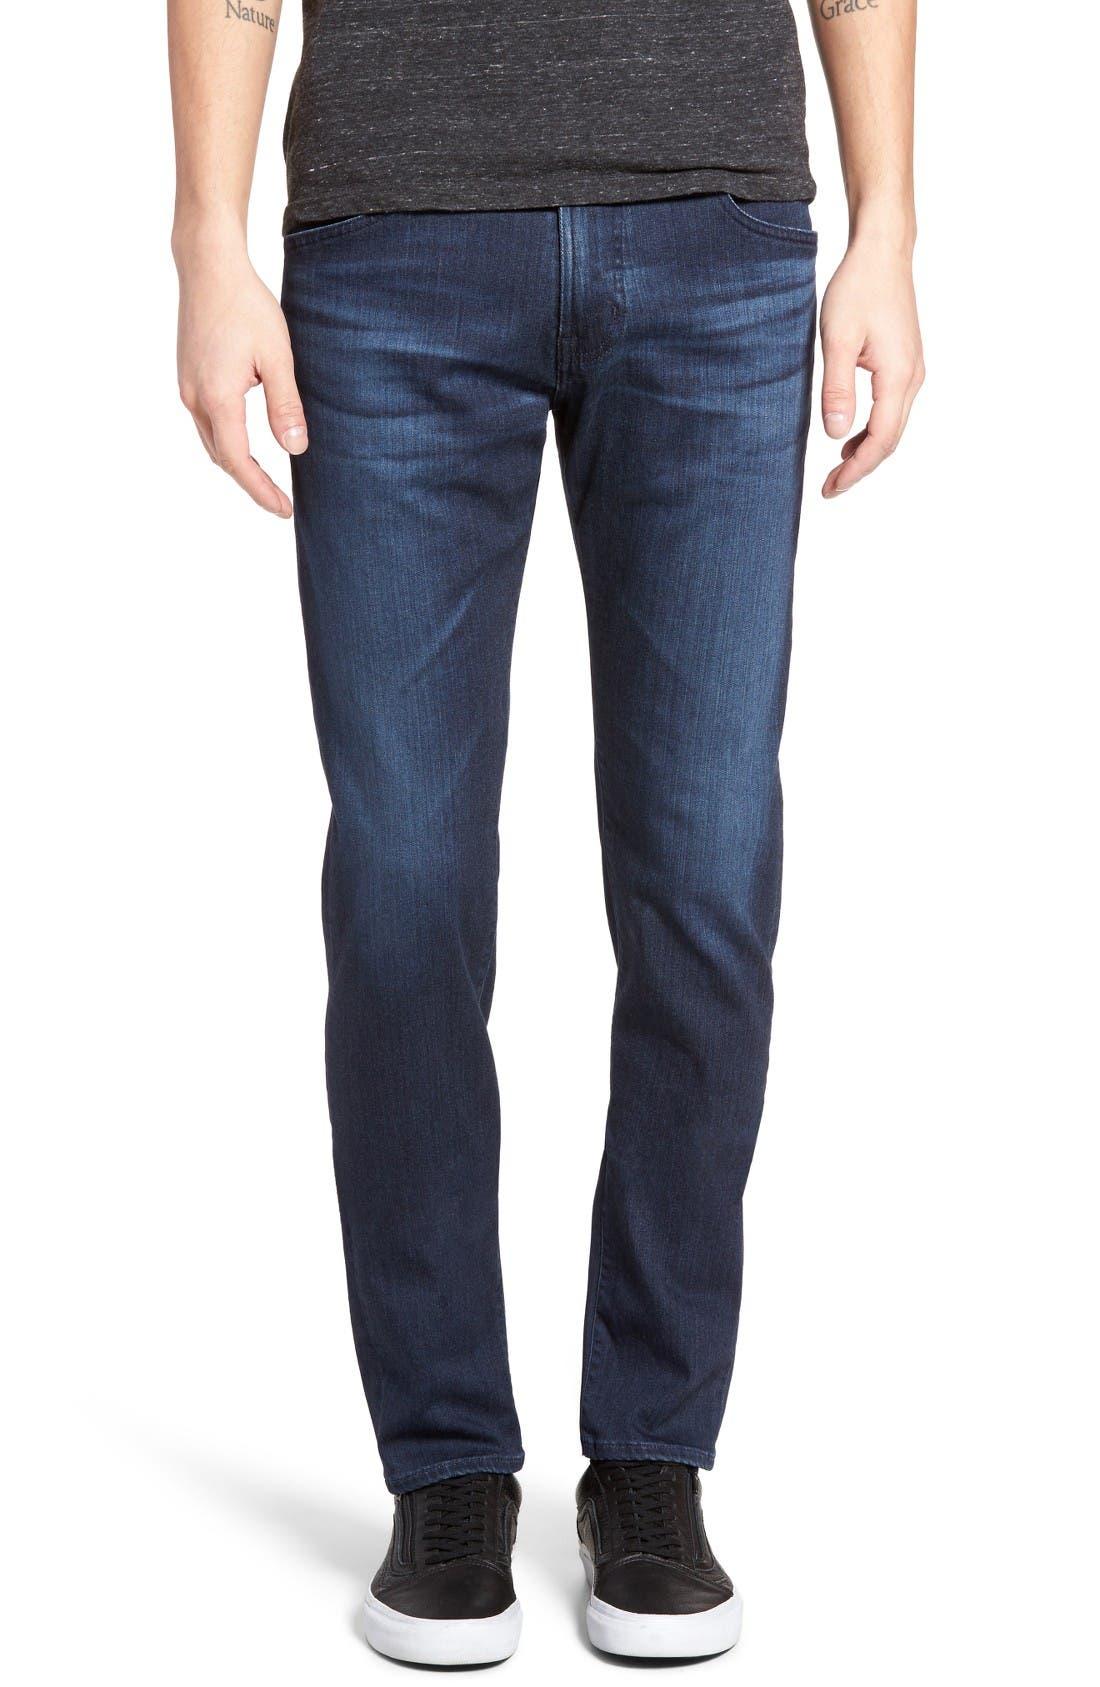 Alternate Image 1 Selected - AG Tellis Slim Fit Jeans (Kast)